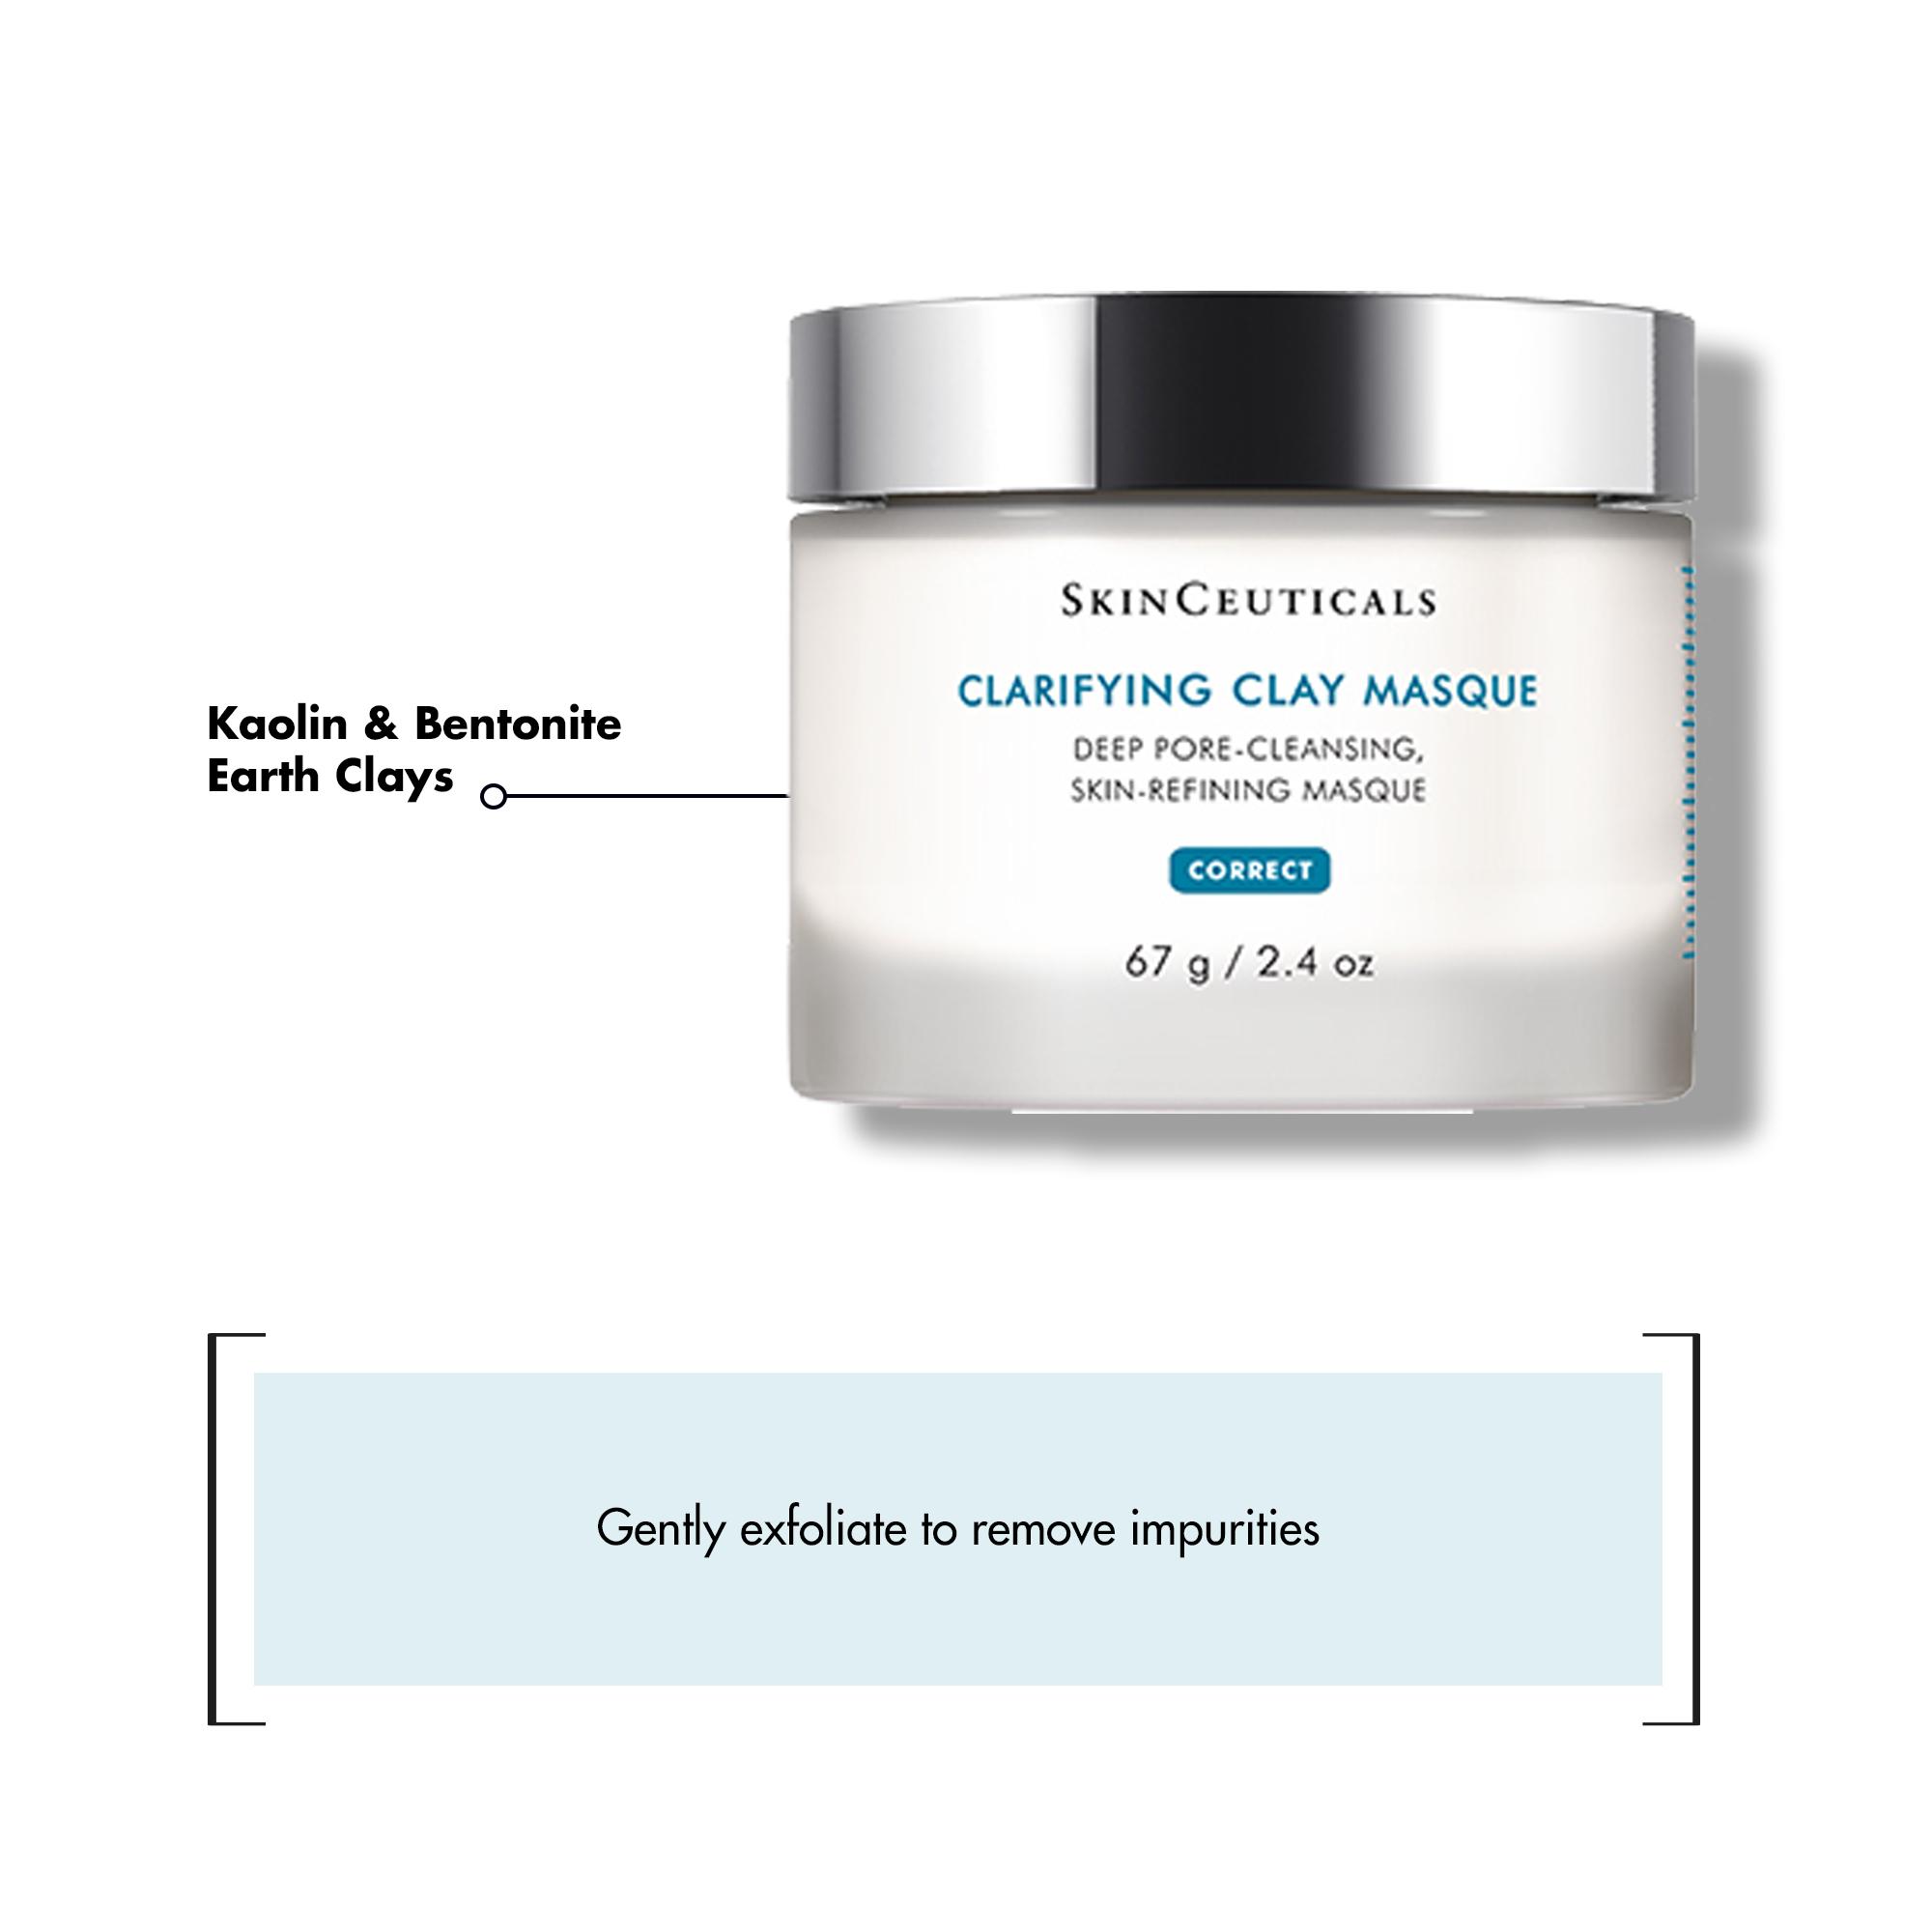 SkinCeuticals Clarifying Clay Masque 60ml